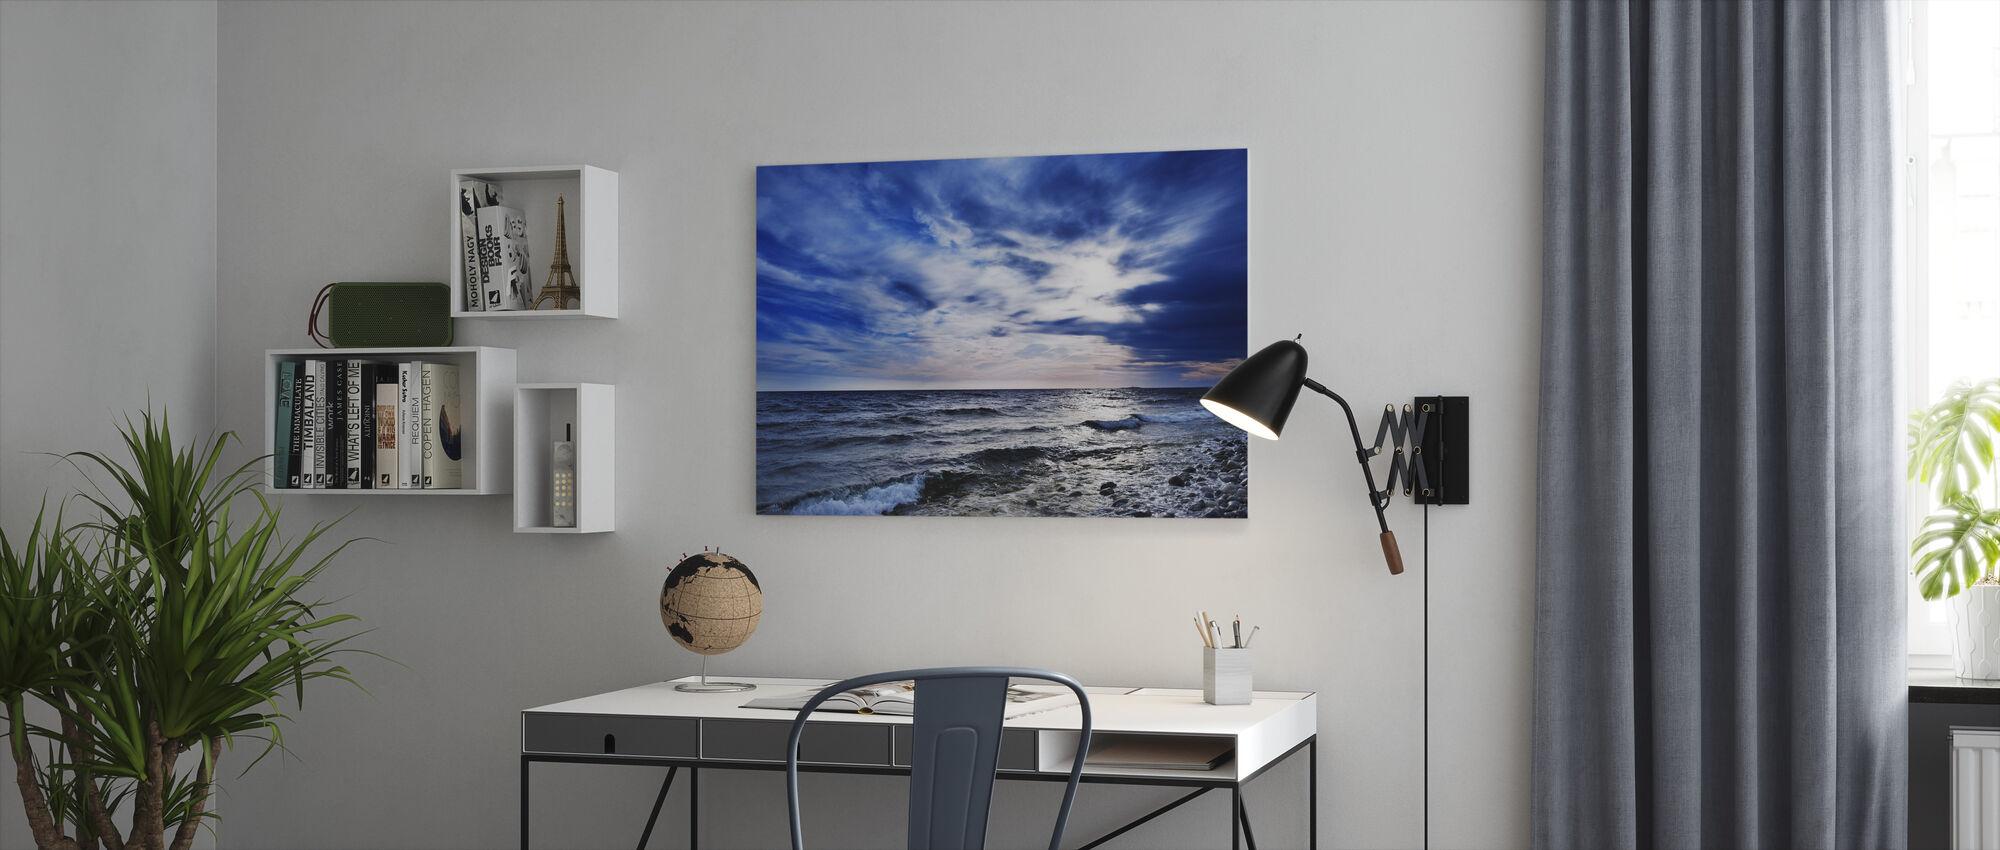 Blå vågor av Torö, Sverige - Canvastavla - Kontor